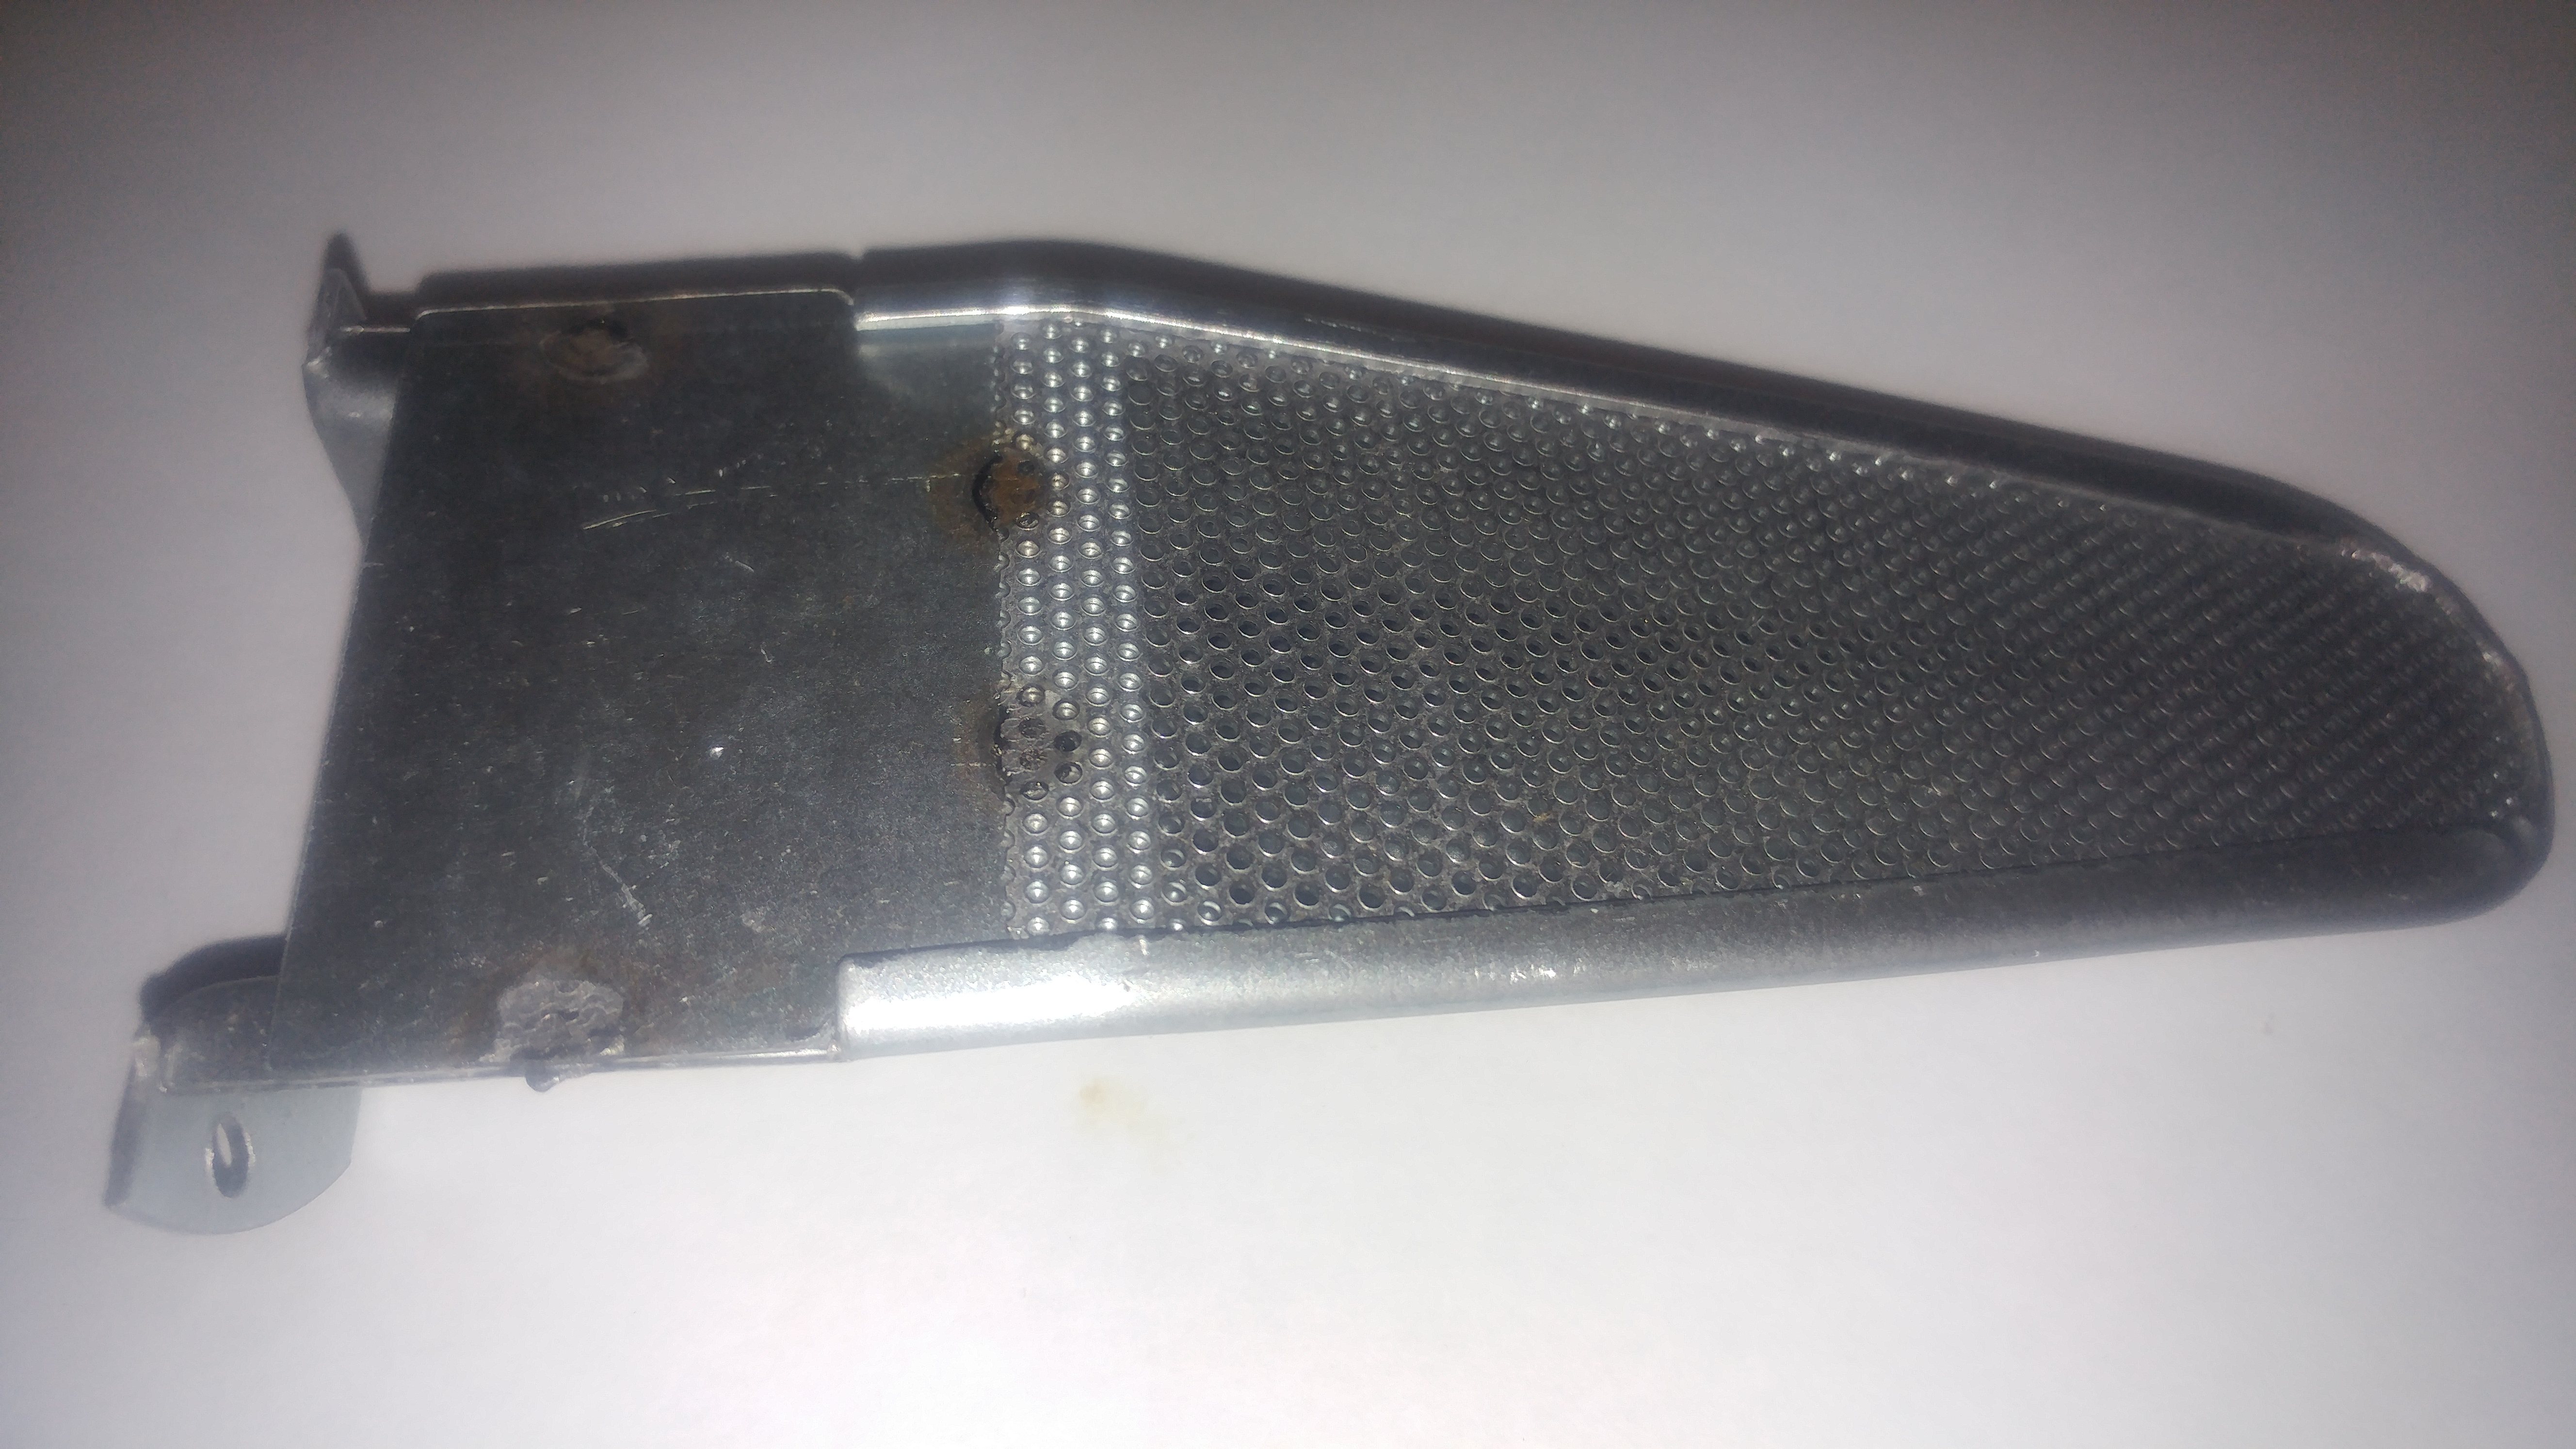 Atwood Hydroflame Furnace Burner Head 30268 Head